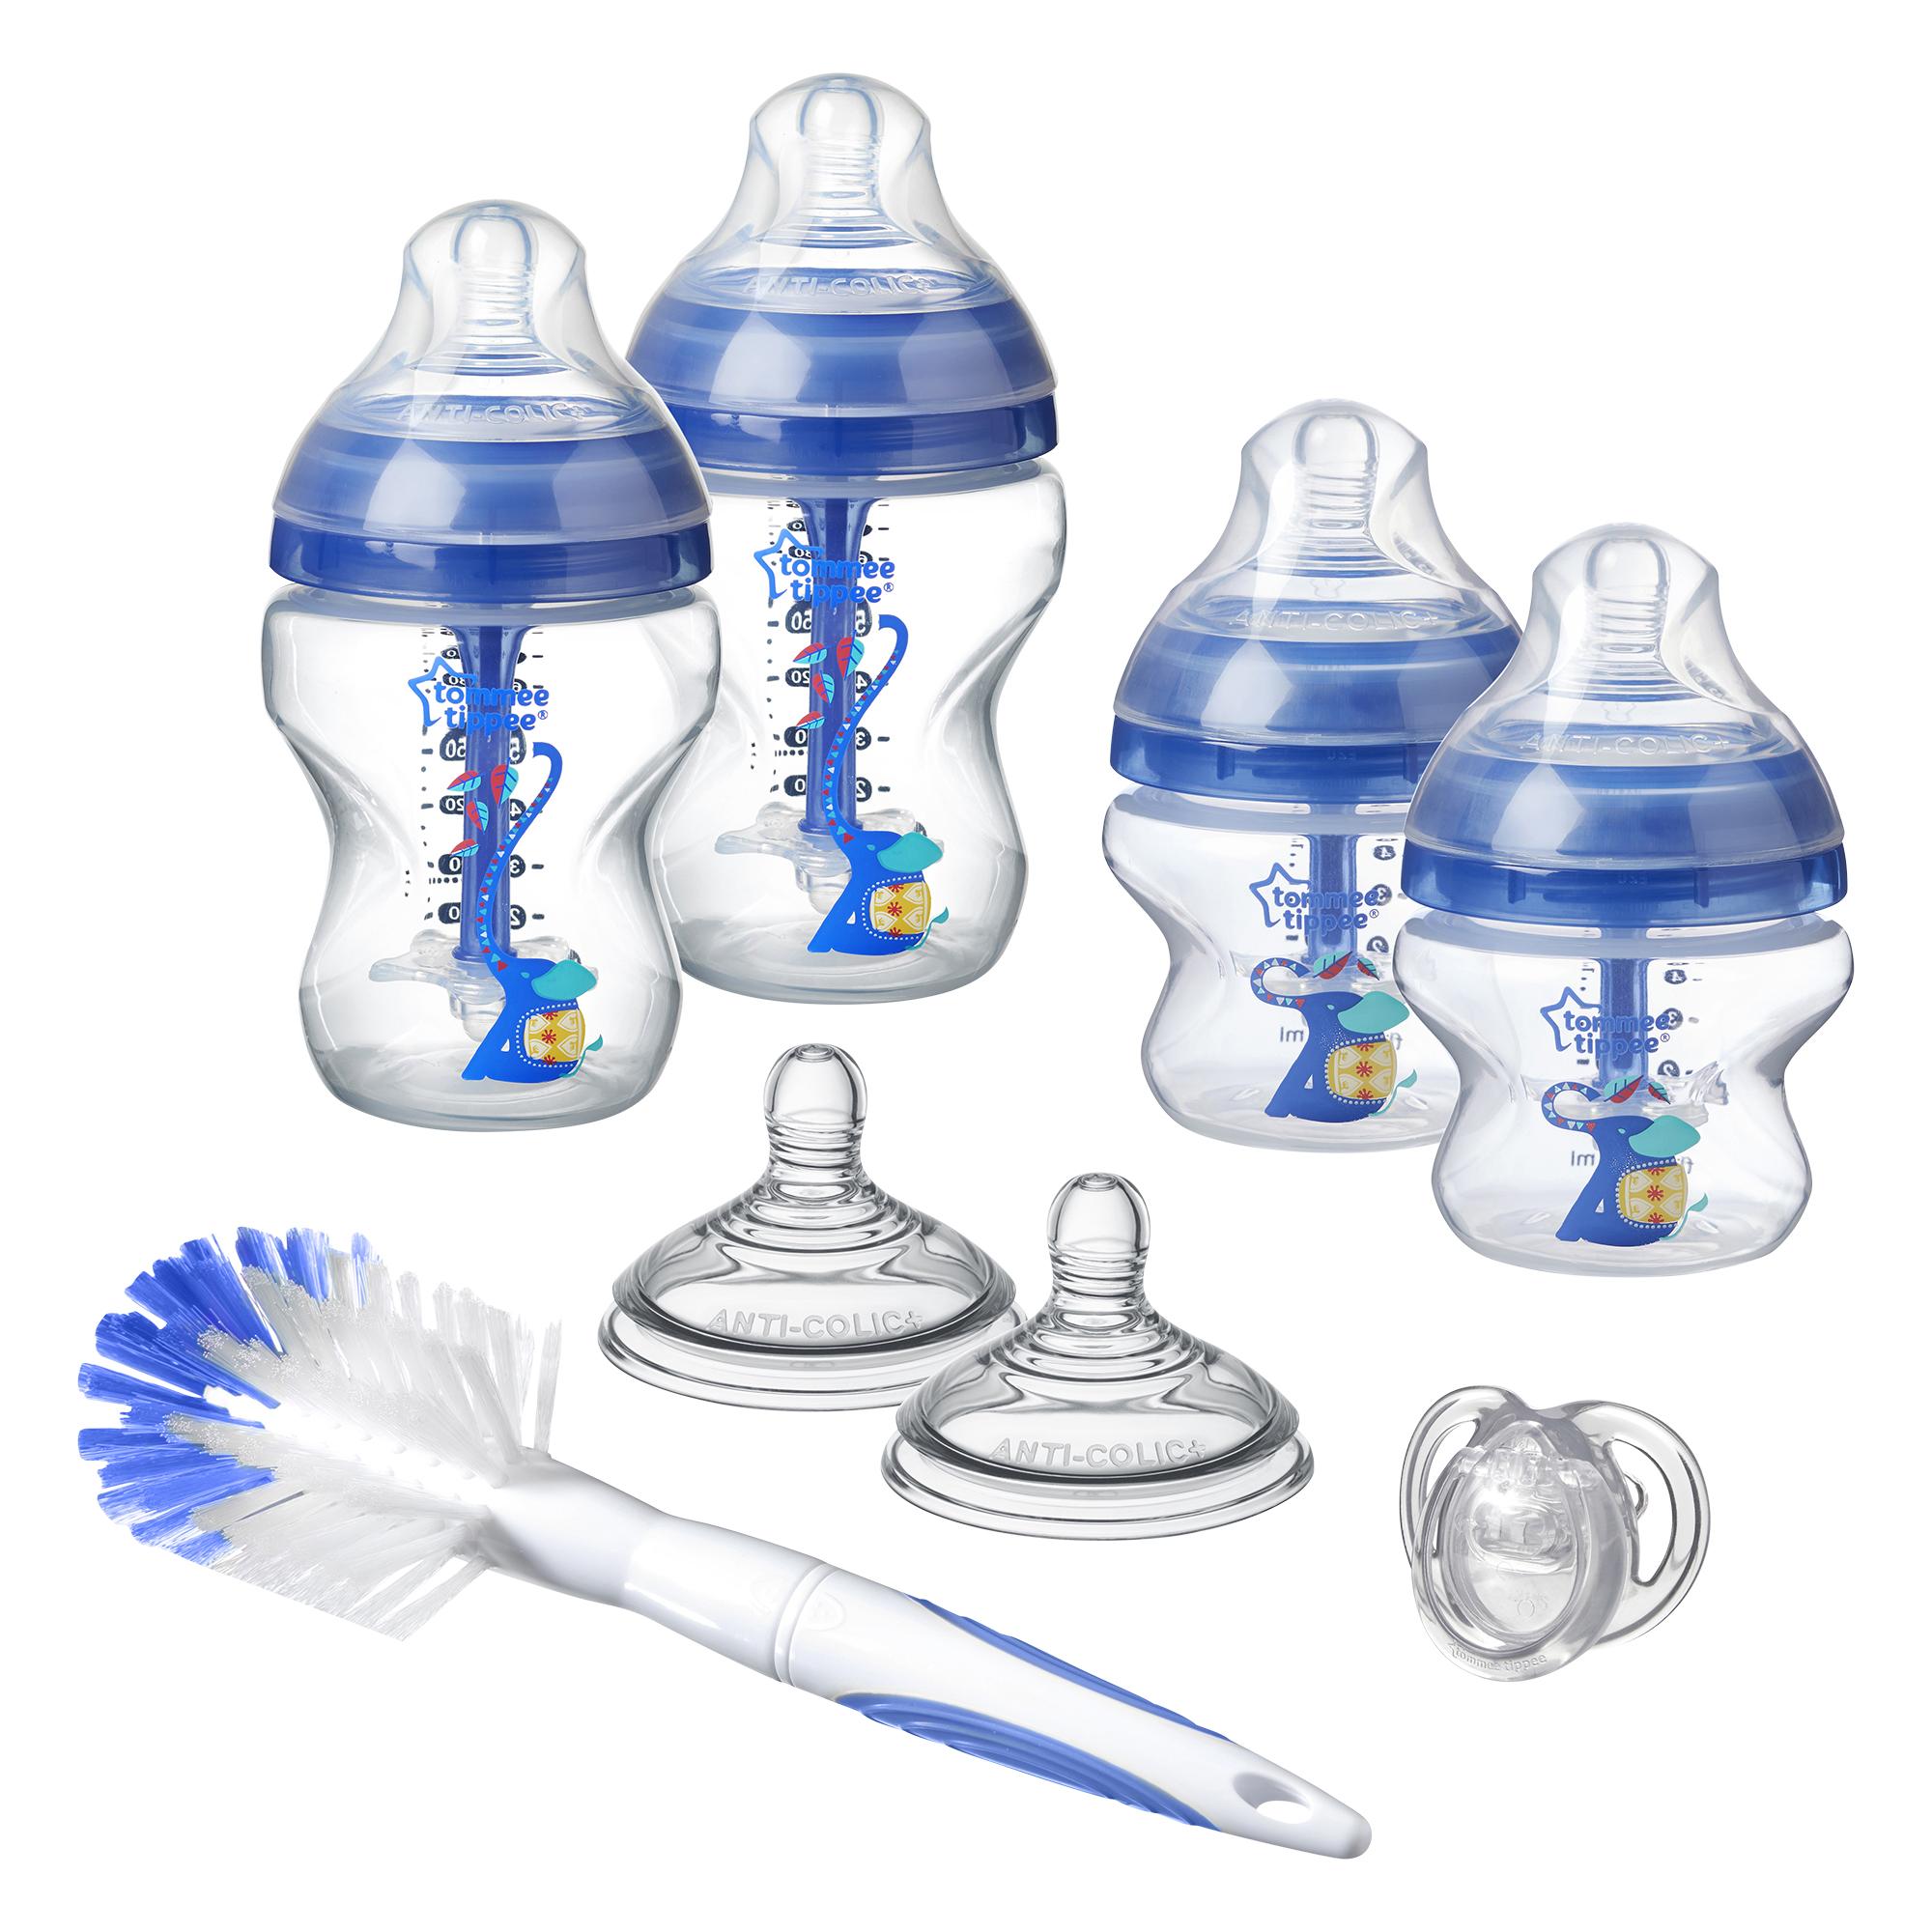 Sada kojeneckých lahviček C2N ANTI-COLIC s kartáčem Blue